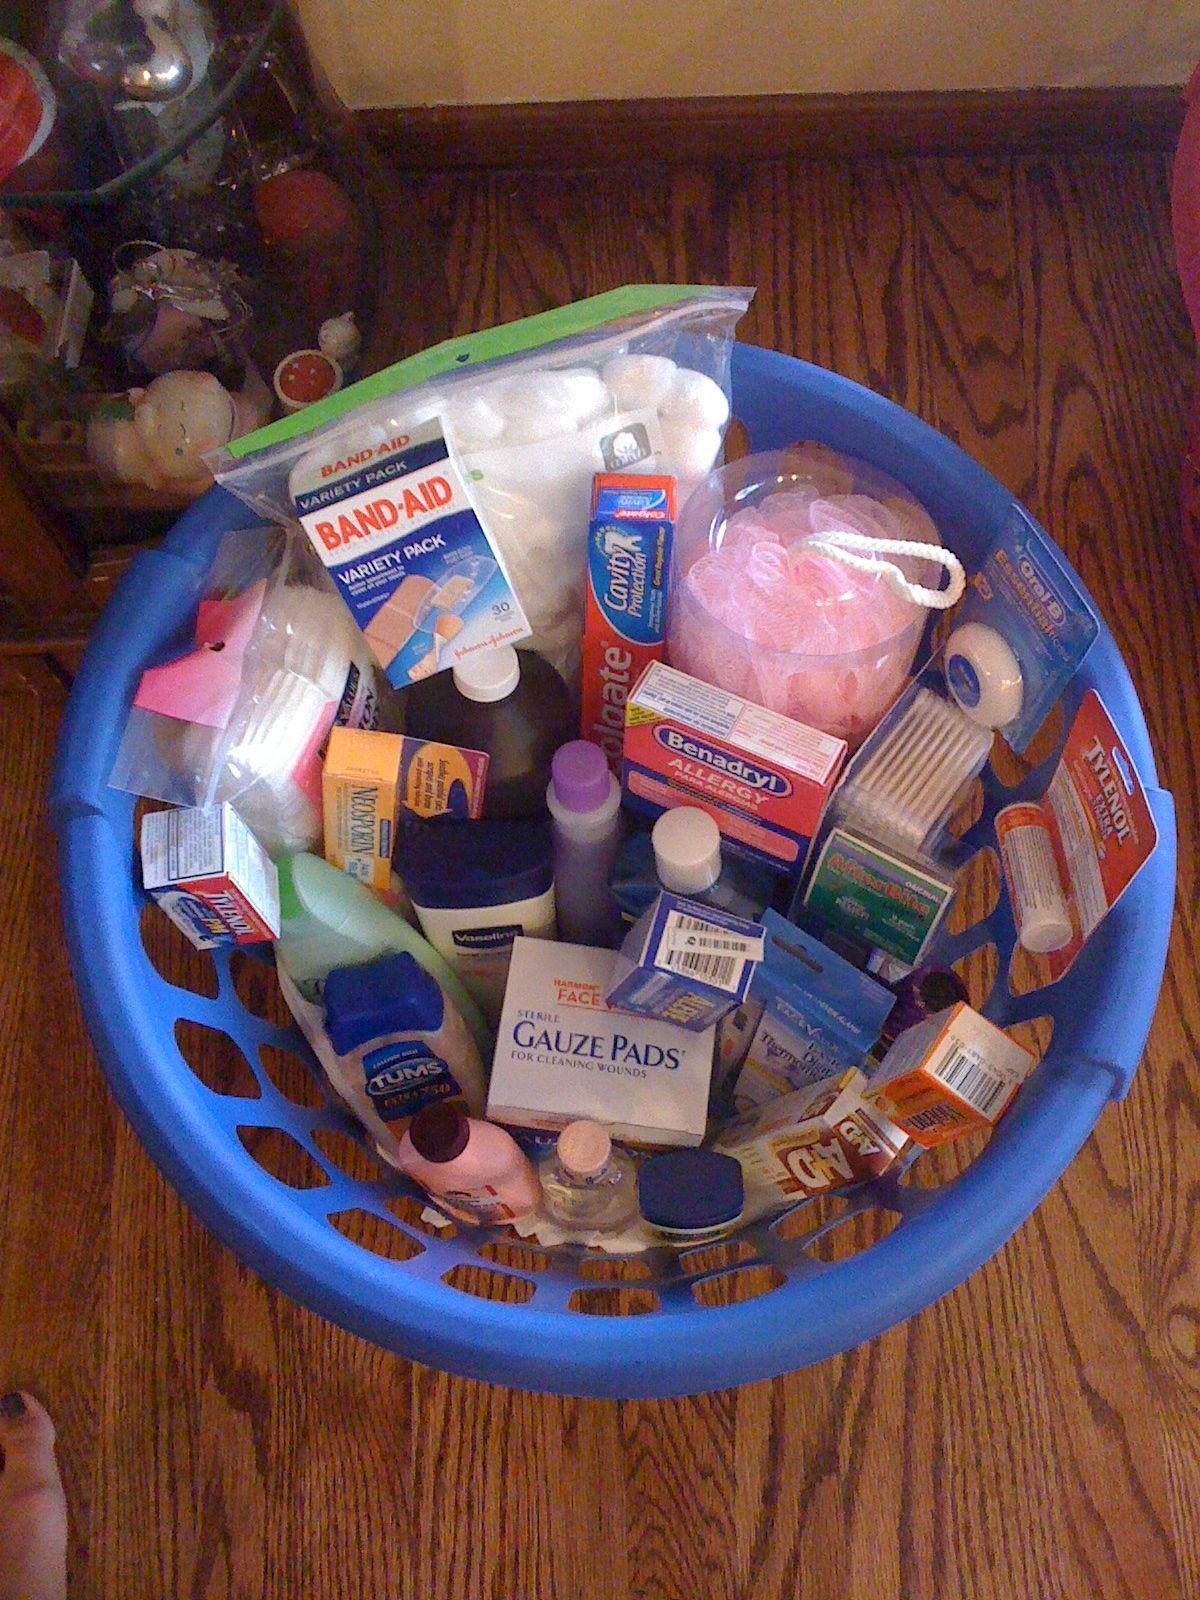 Wedding Shower Gift Basket full of medicine